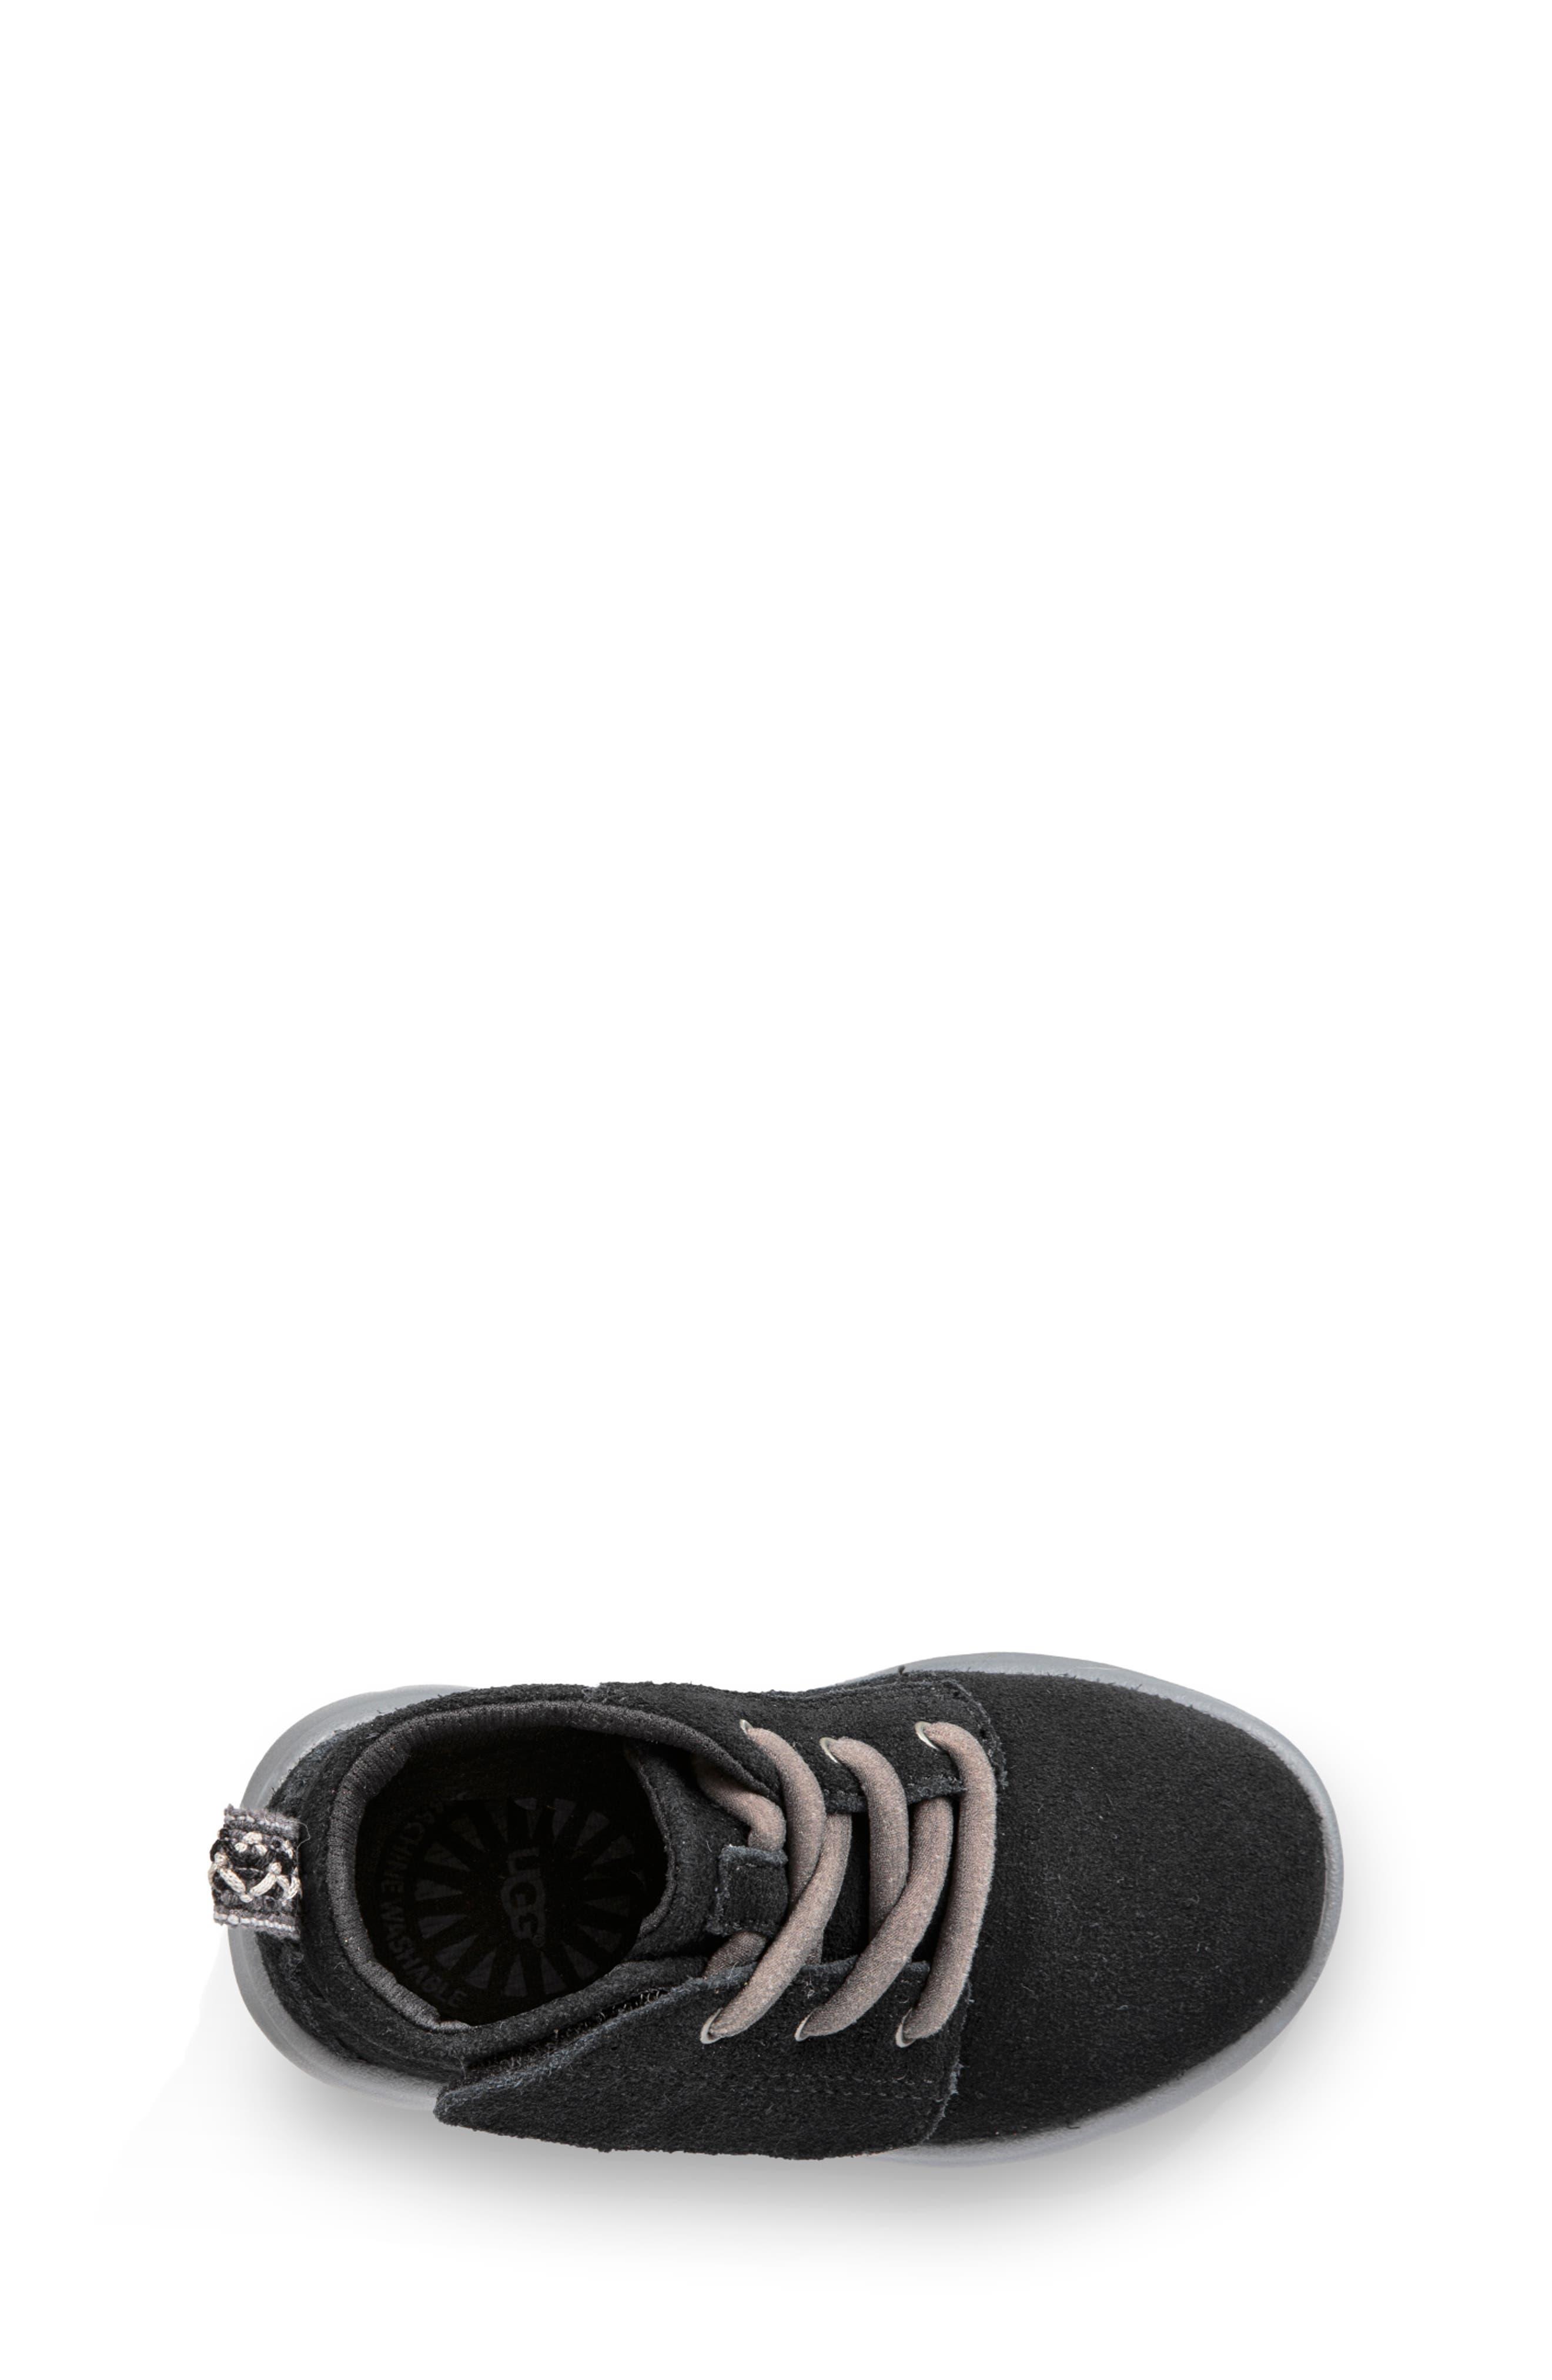 Canoe Washable Chukka Sneaker,                             Alternate thumbnail 4, color,                             BLACK